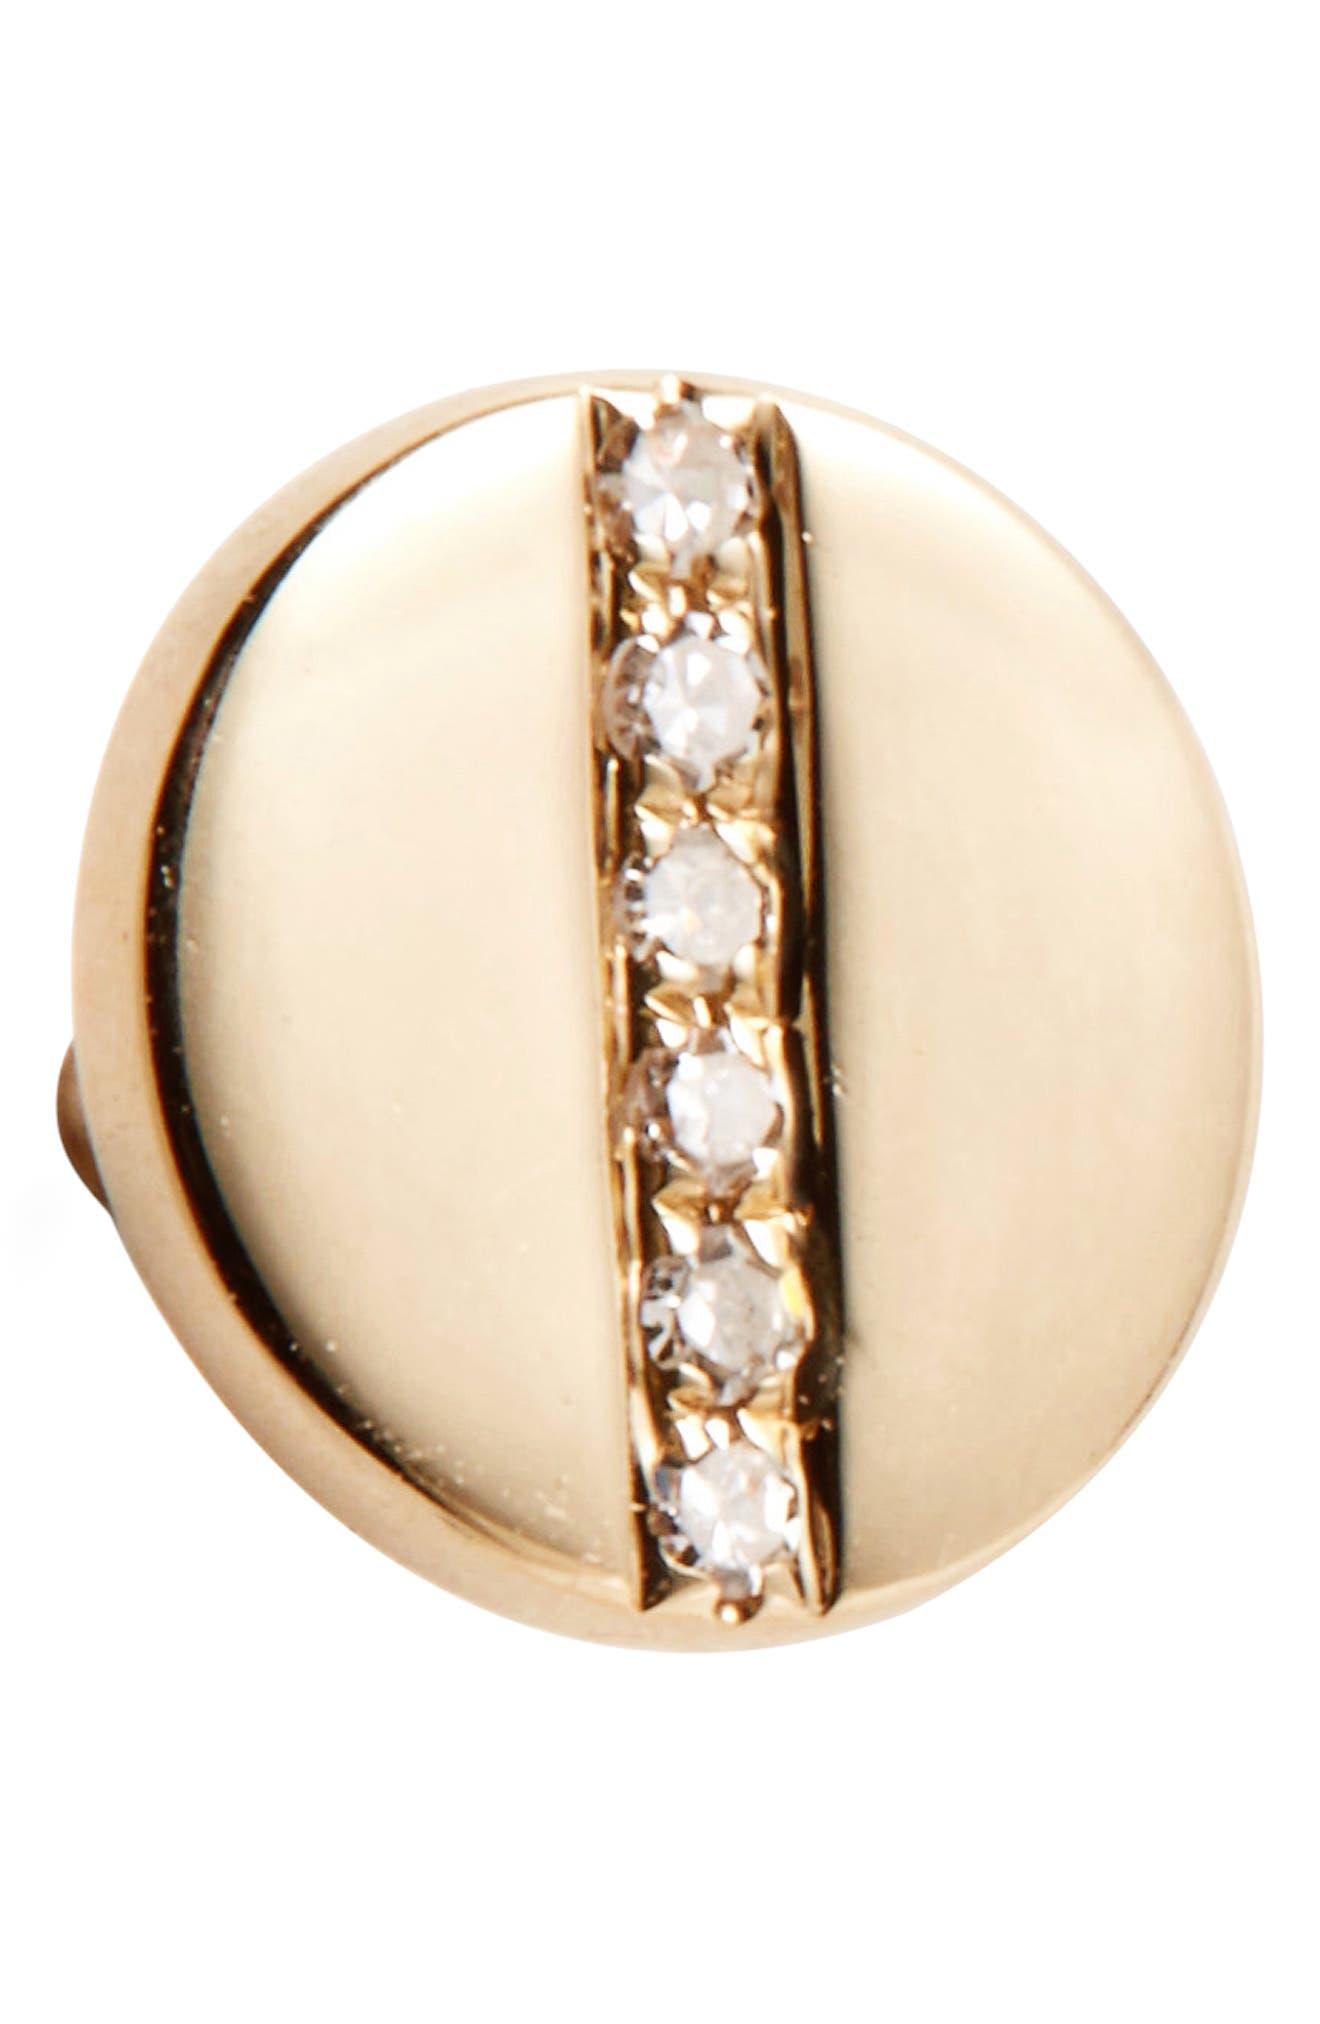 Screw Diamond Stud Earrings,                             Alternate thumbnail 6, color,                             YELLOW GOLD